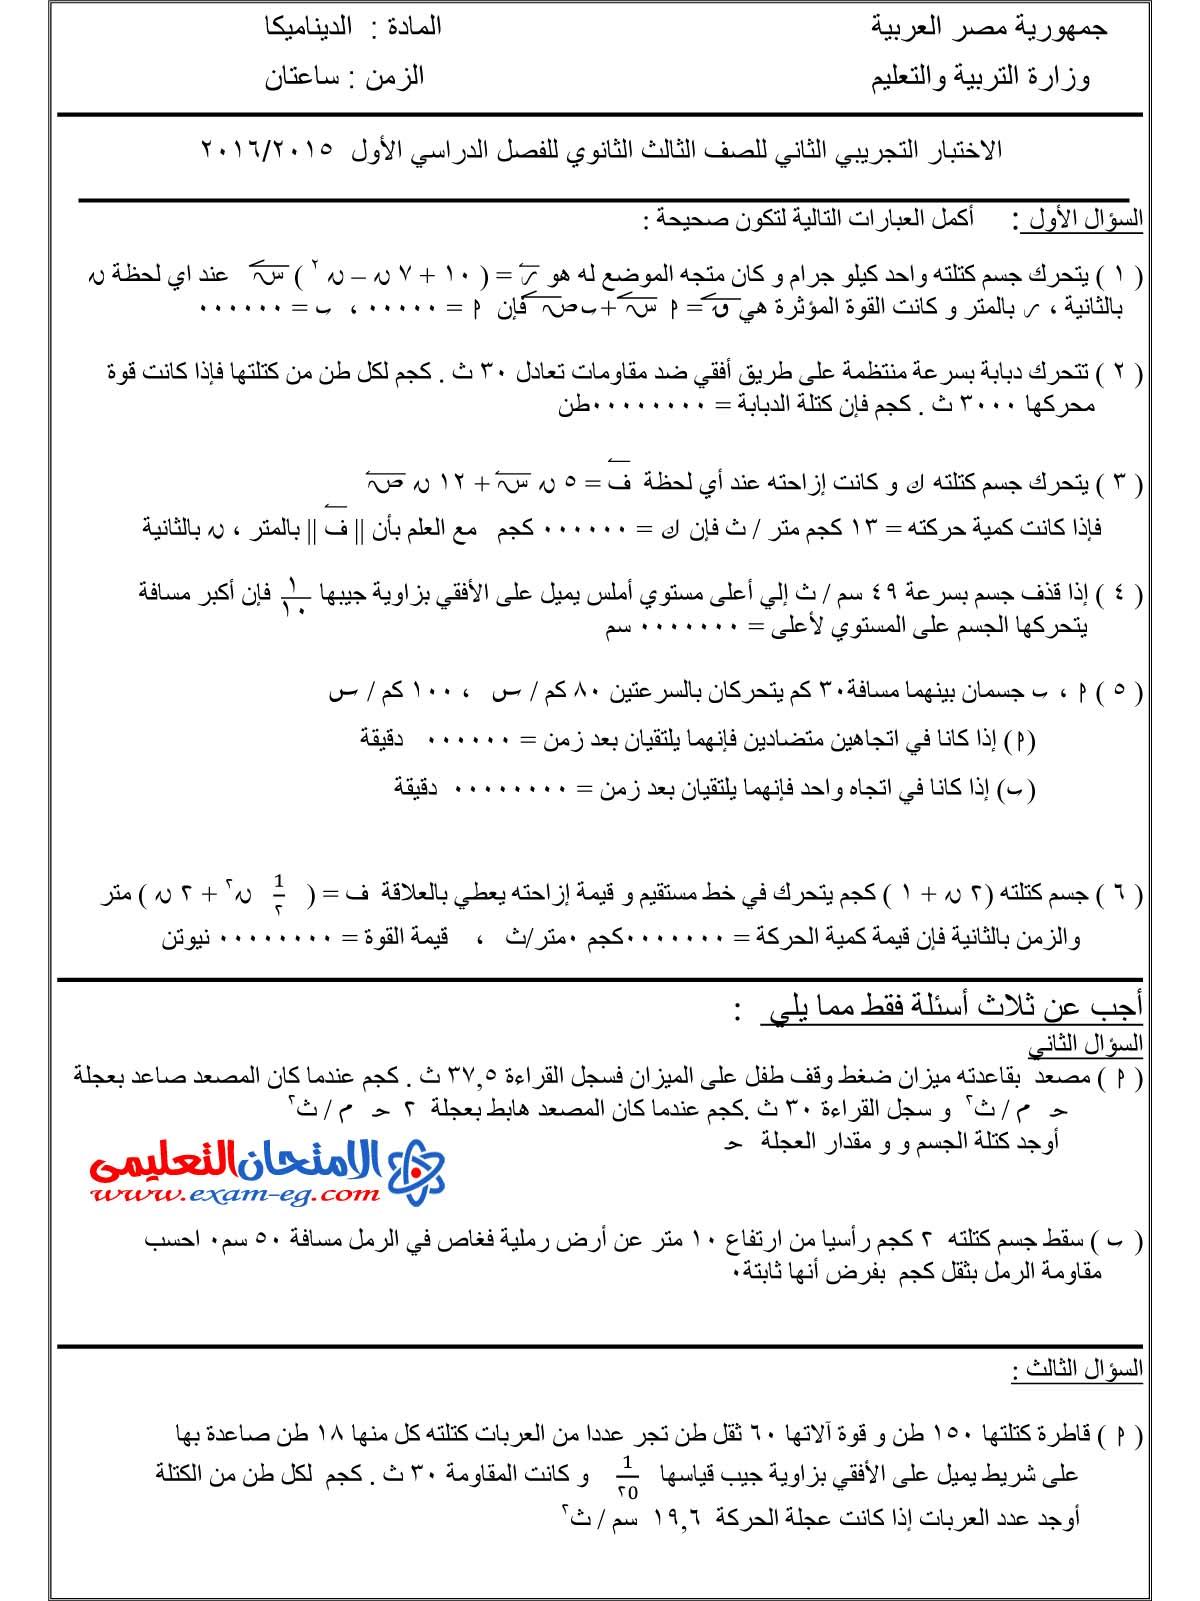 exam-eg.com_1460420680923.jpg